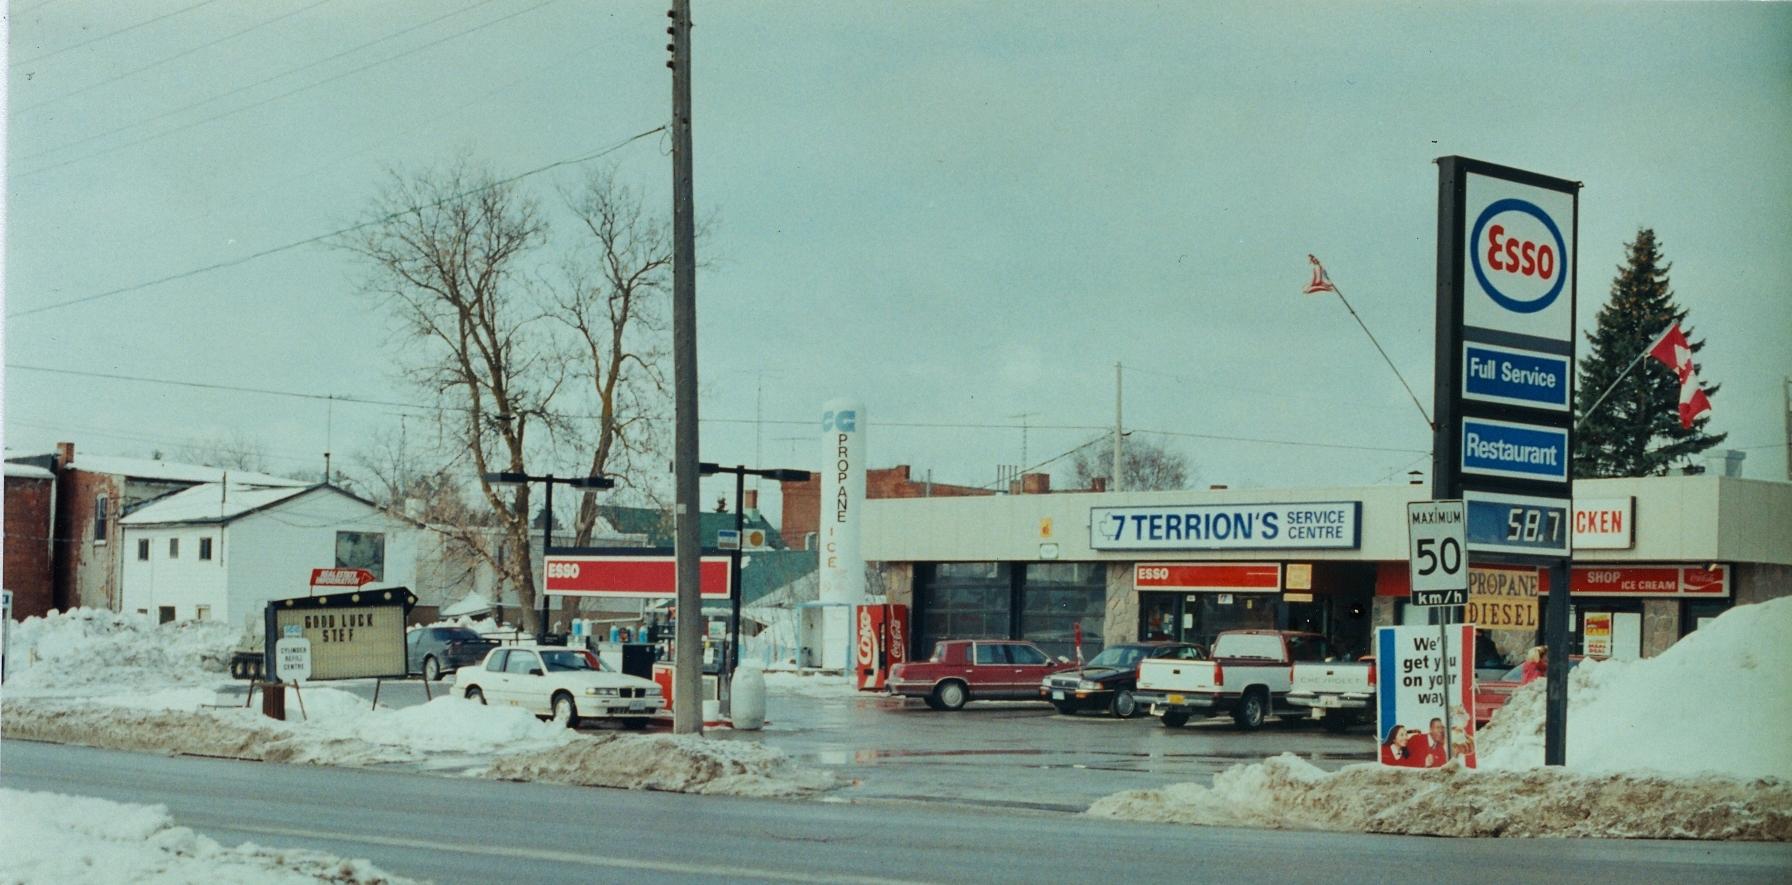 Terrion's Esso.jpg